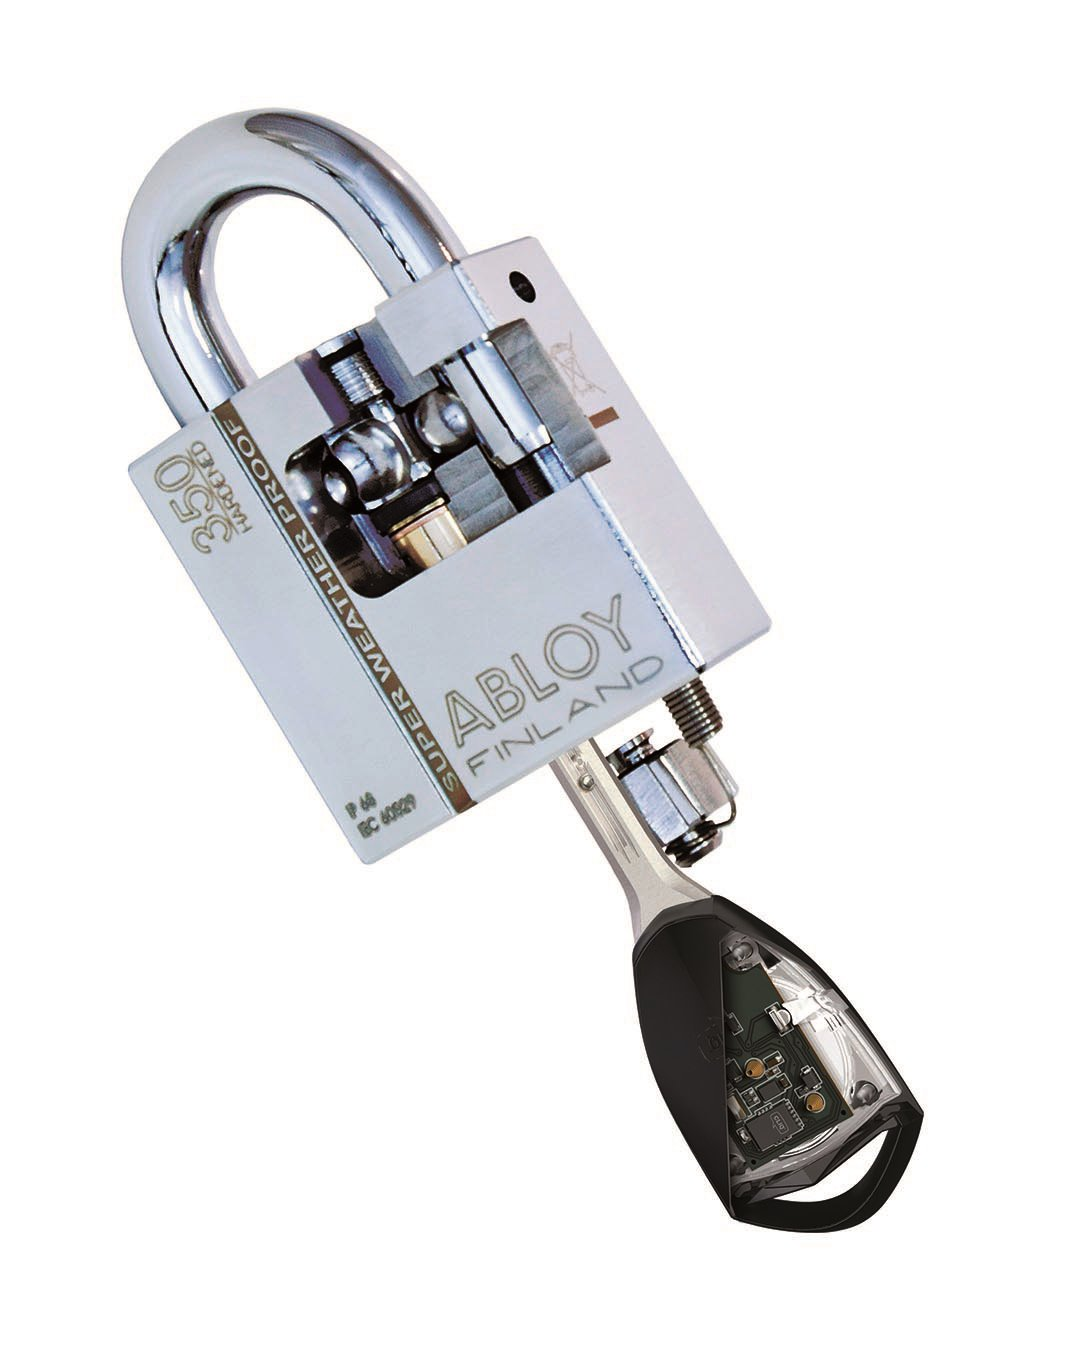 New CLIQ padlock